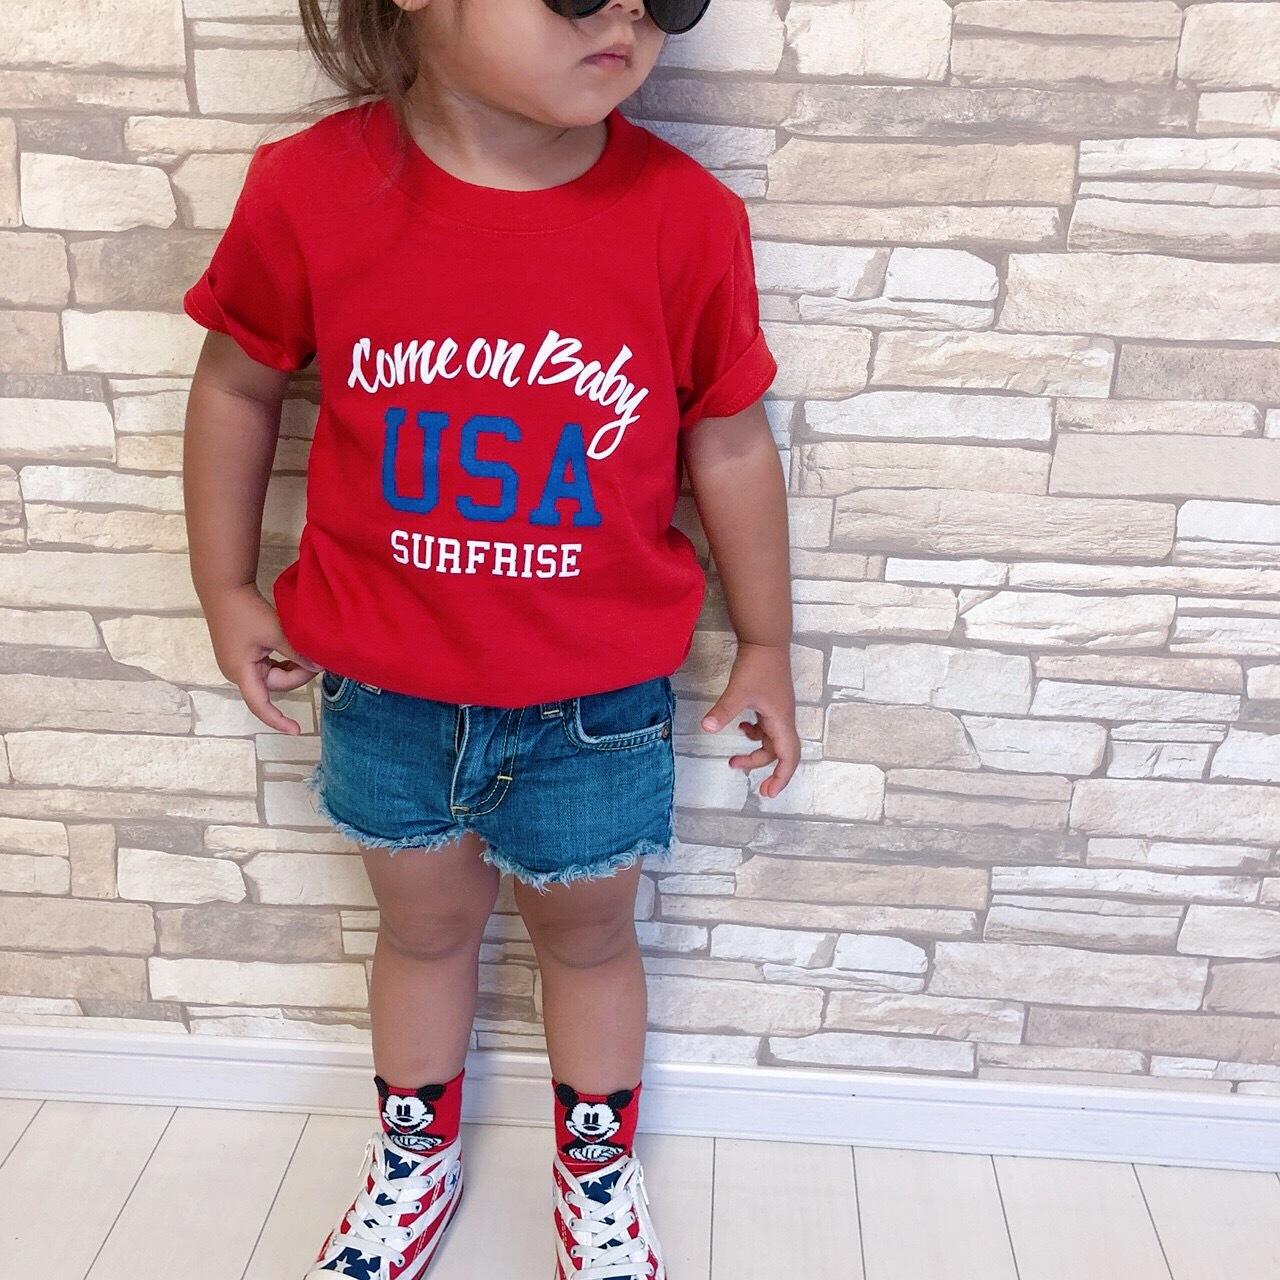 ★Kids★ Come on baby USA Tee - Red